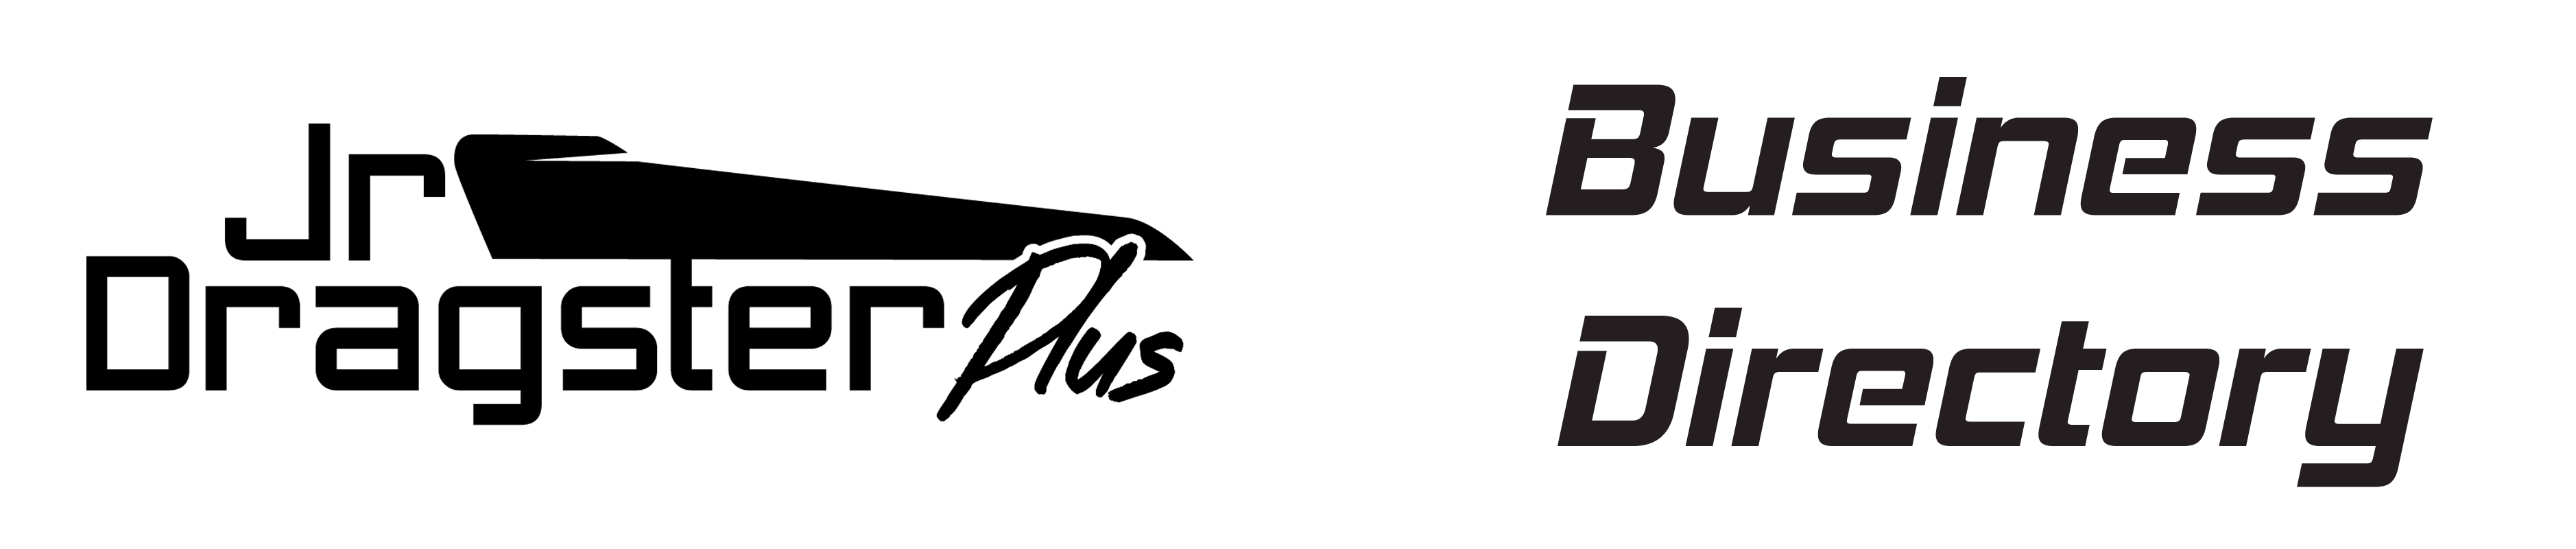 Jr Dragster Plus Business Directory Header Image